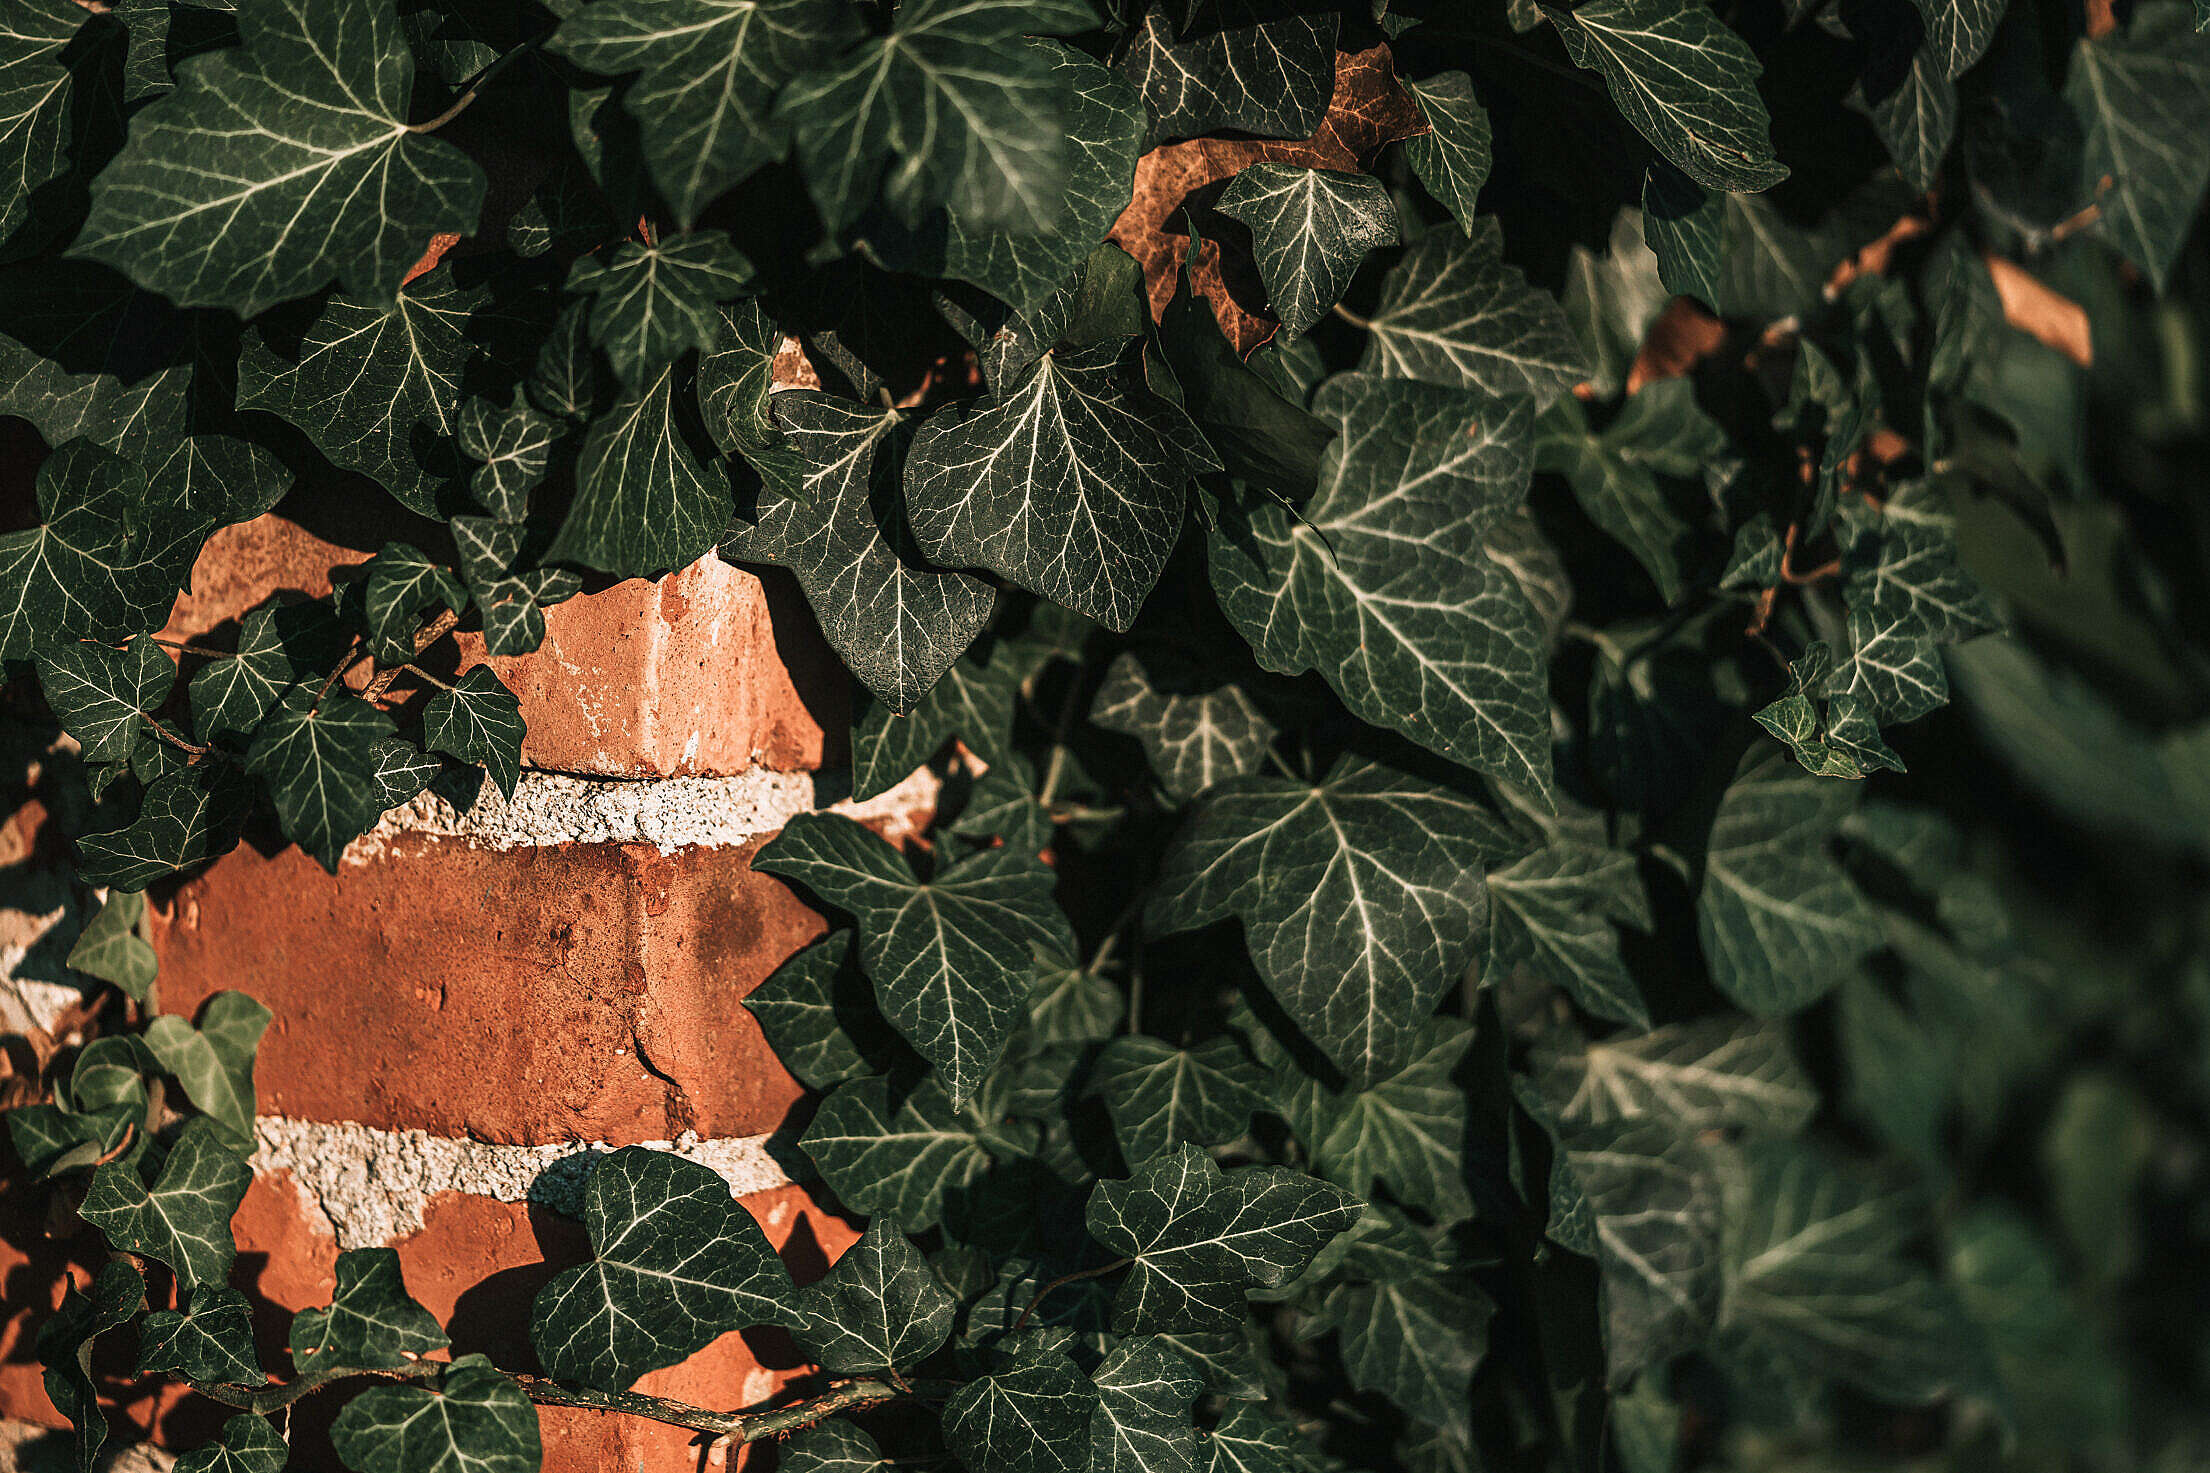 Ivy on a Brick Wall Free Stock Photo